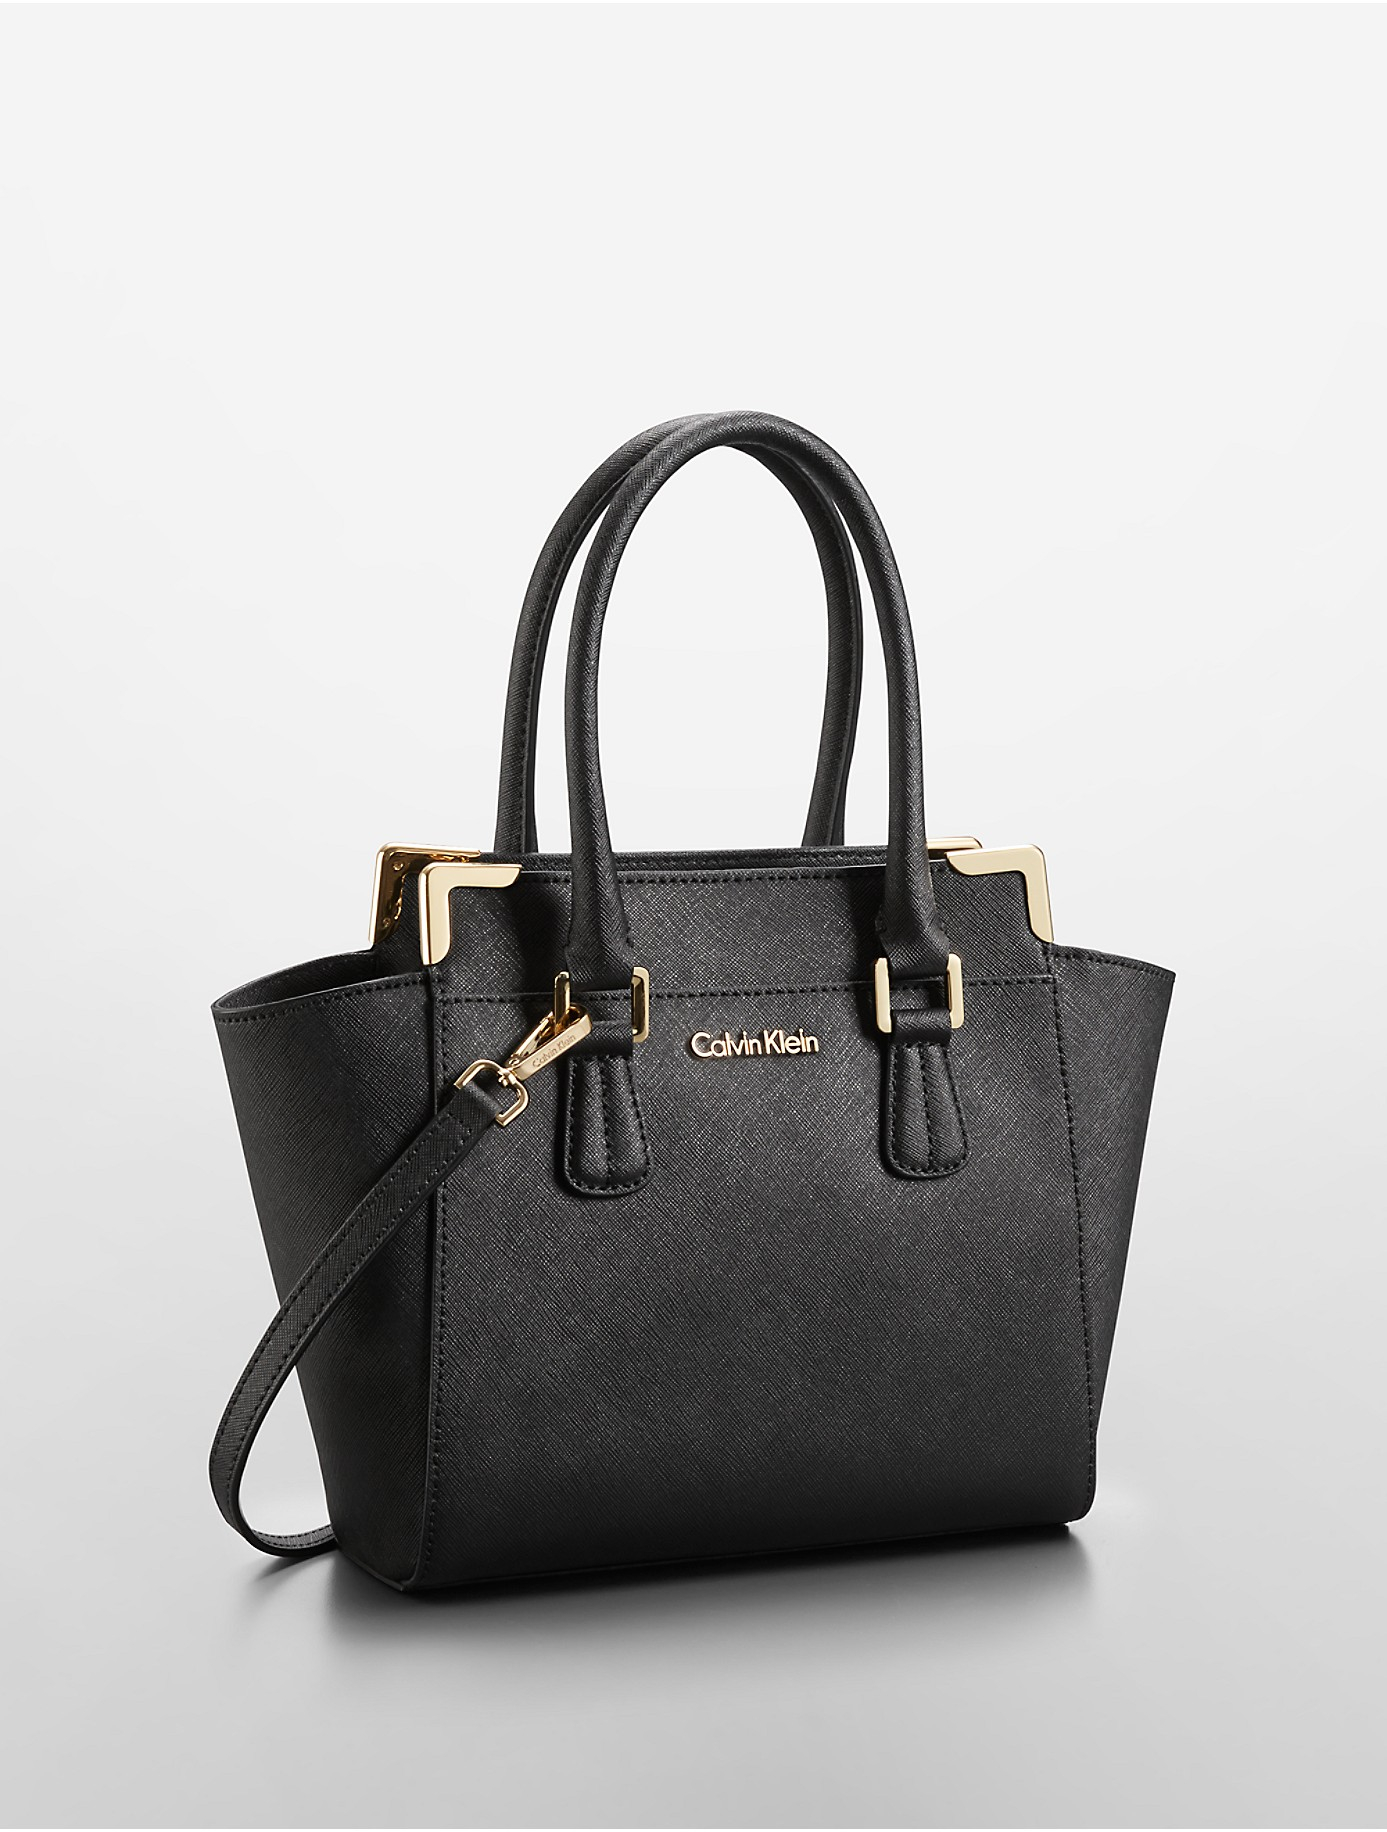 Calvin Klein Saffiano Leather Small Winged Tote Bag In